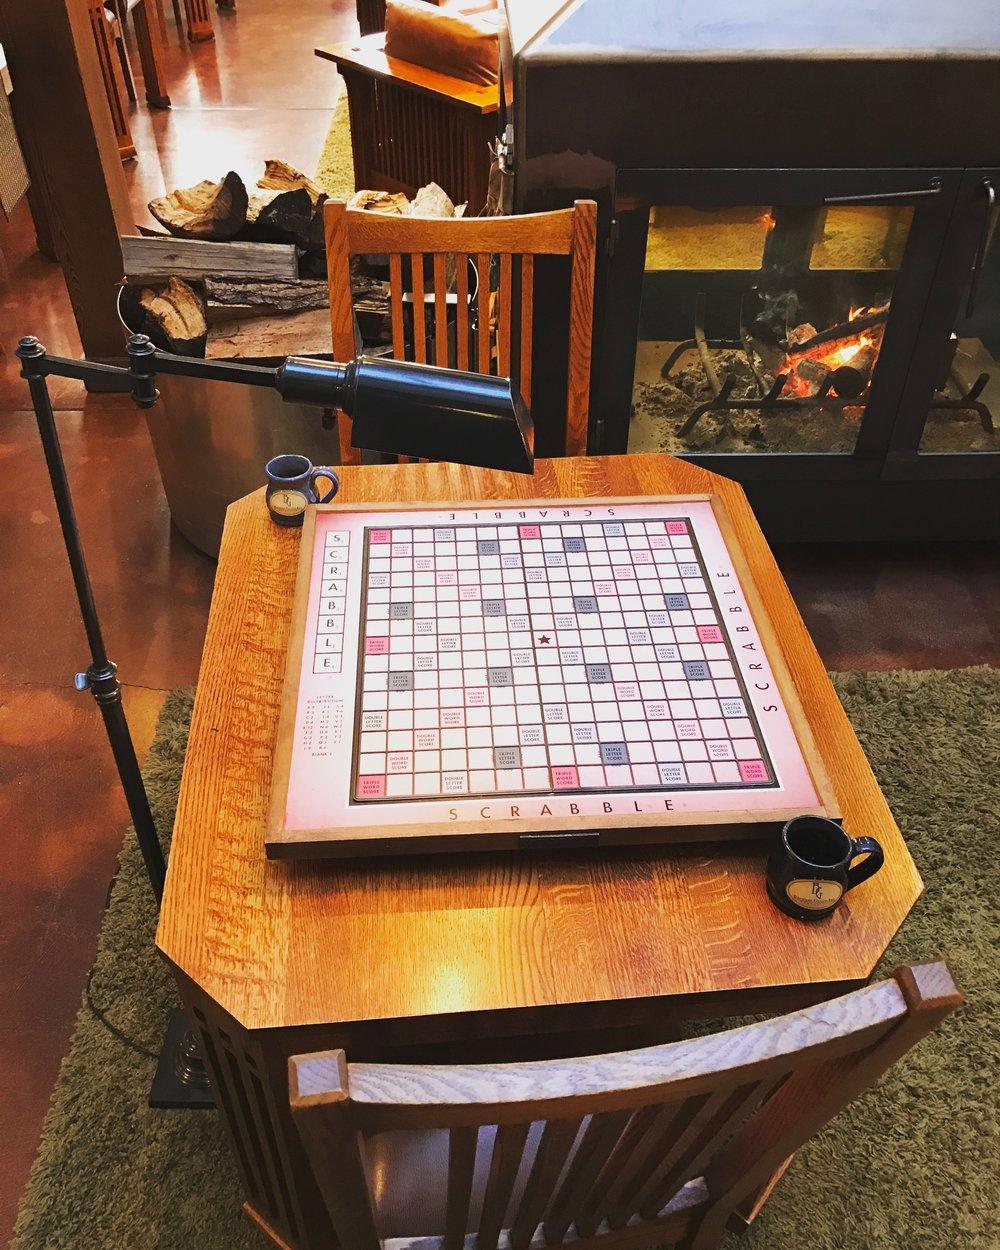 The amazing jumbo Scrabble board that I won many rounds on.